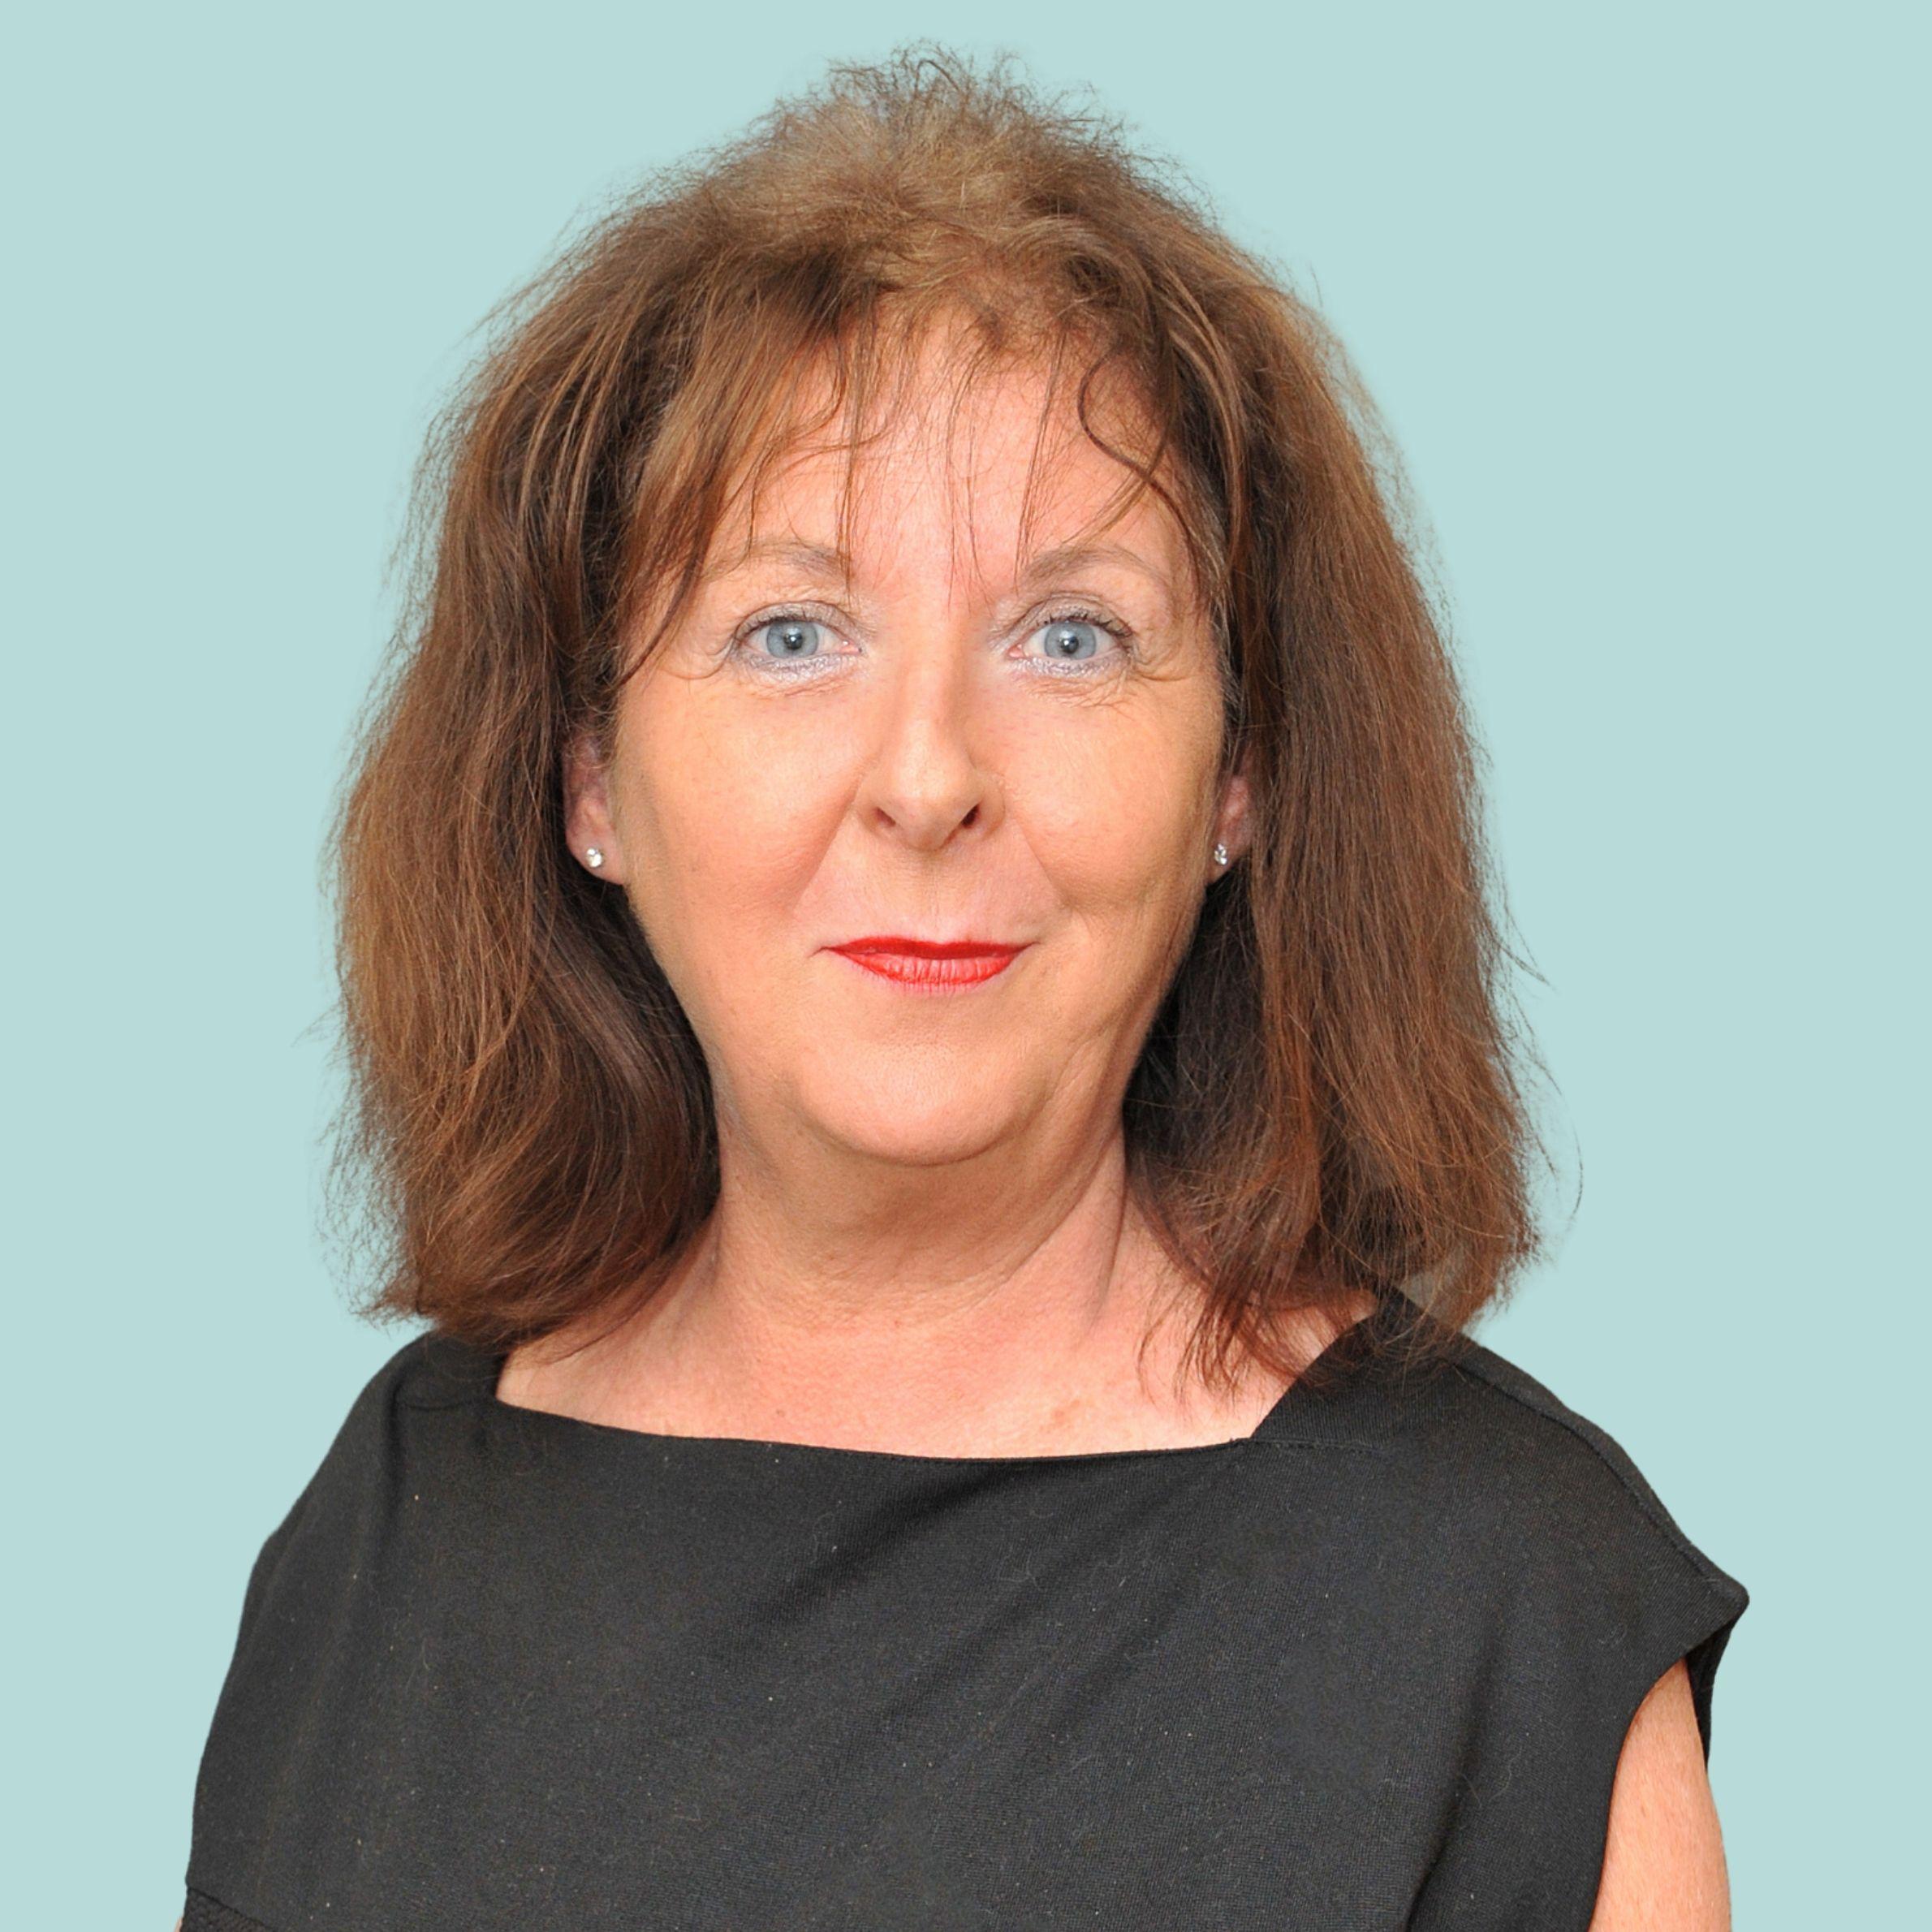 June O'Brien